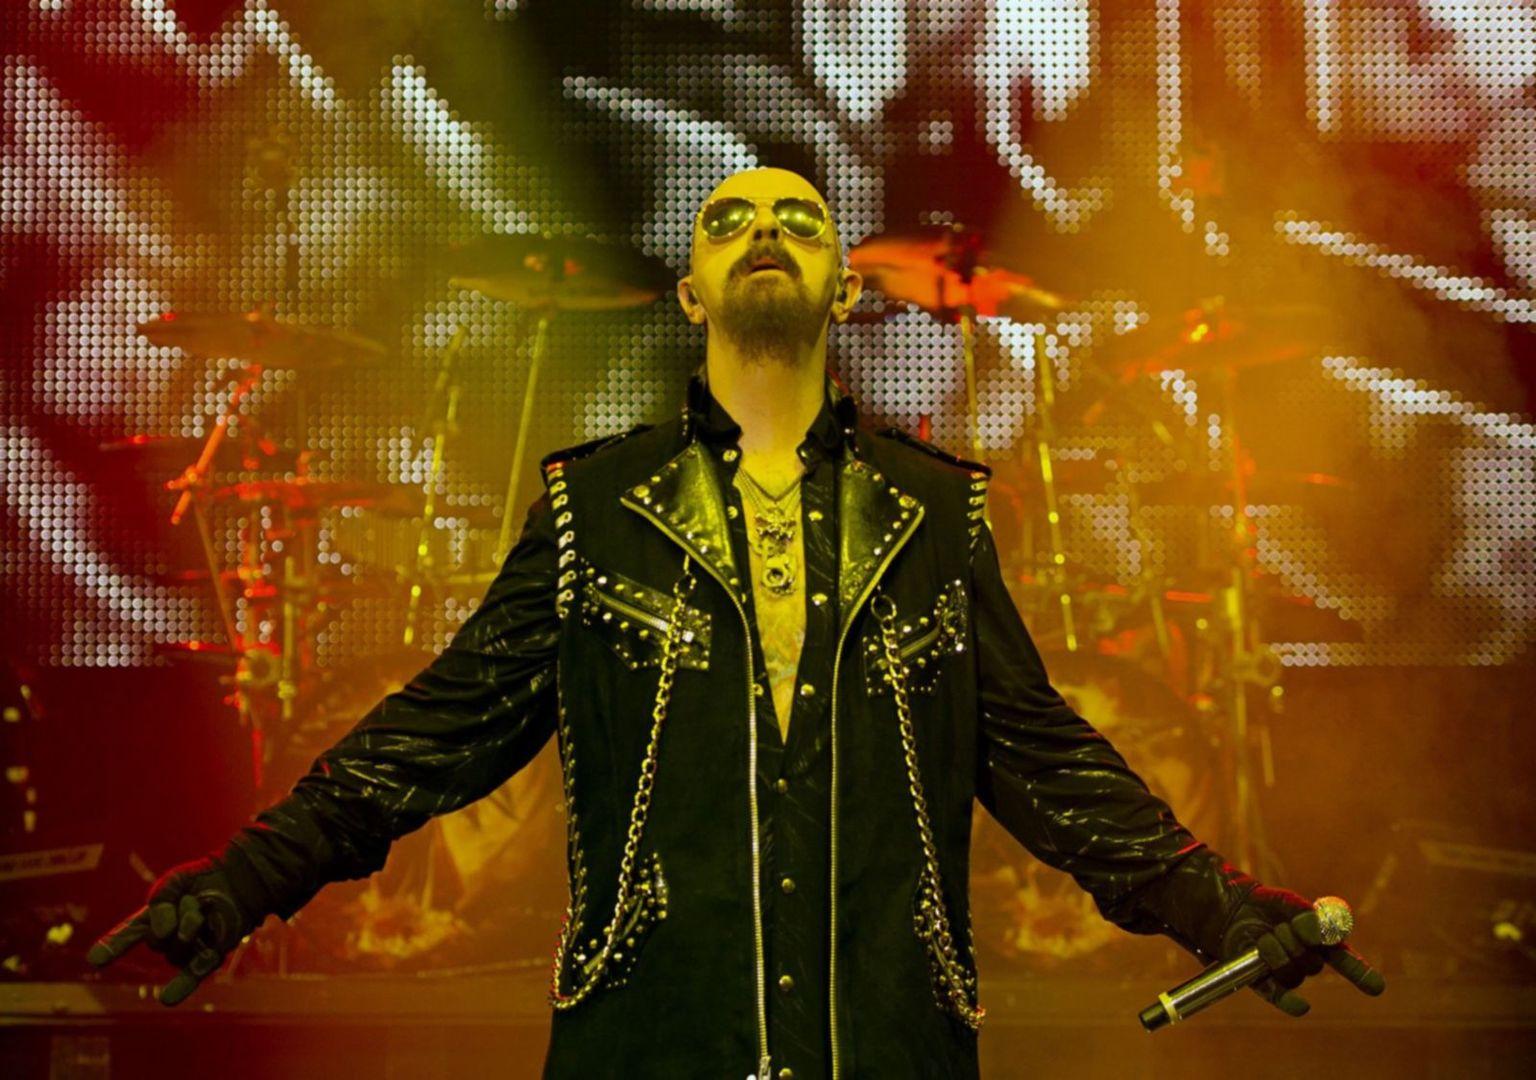 Judas Priest live